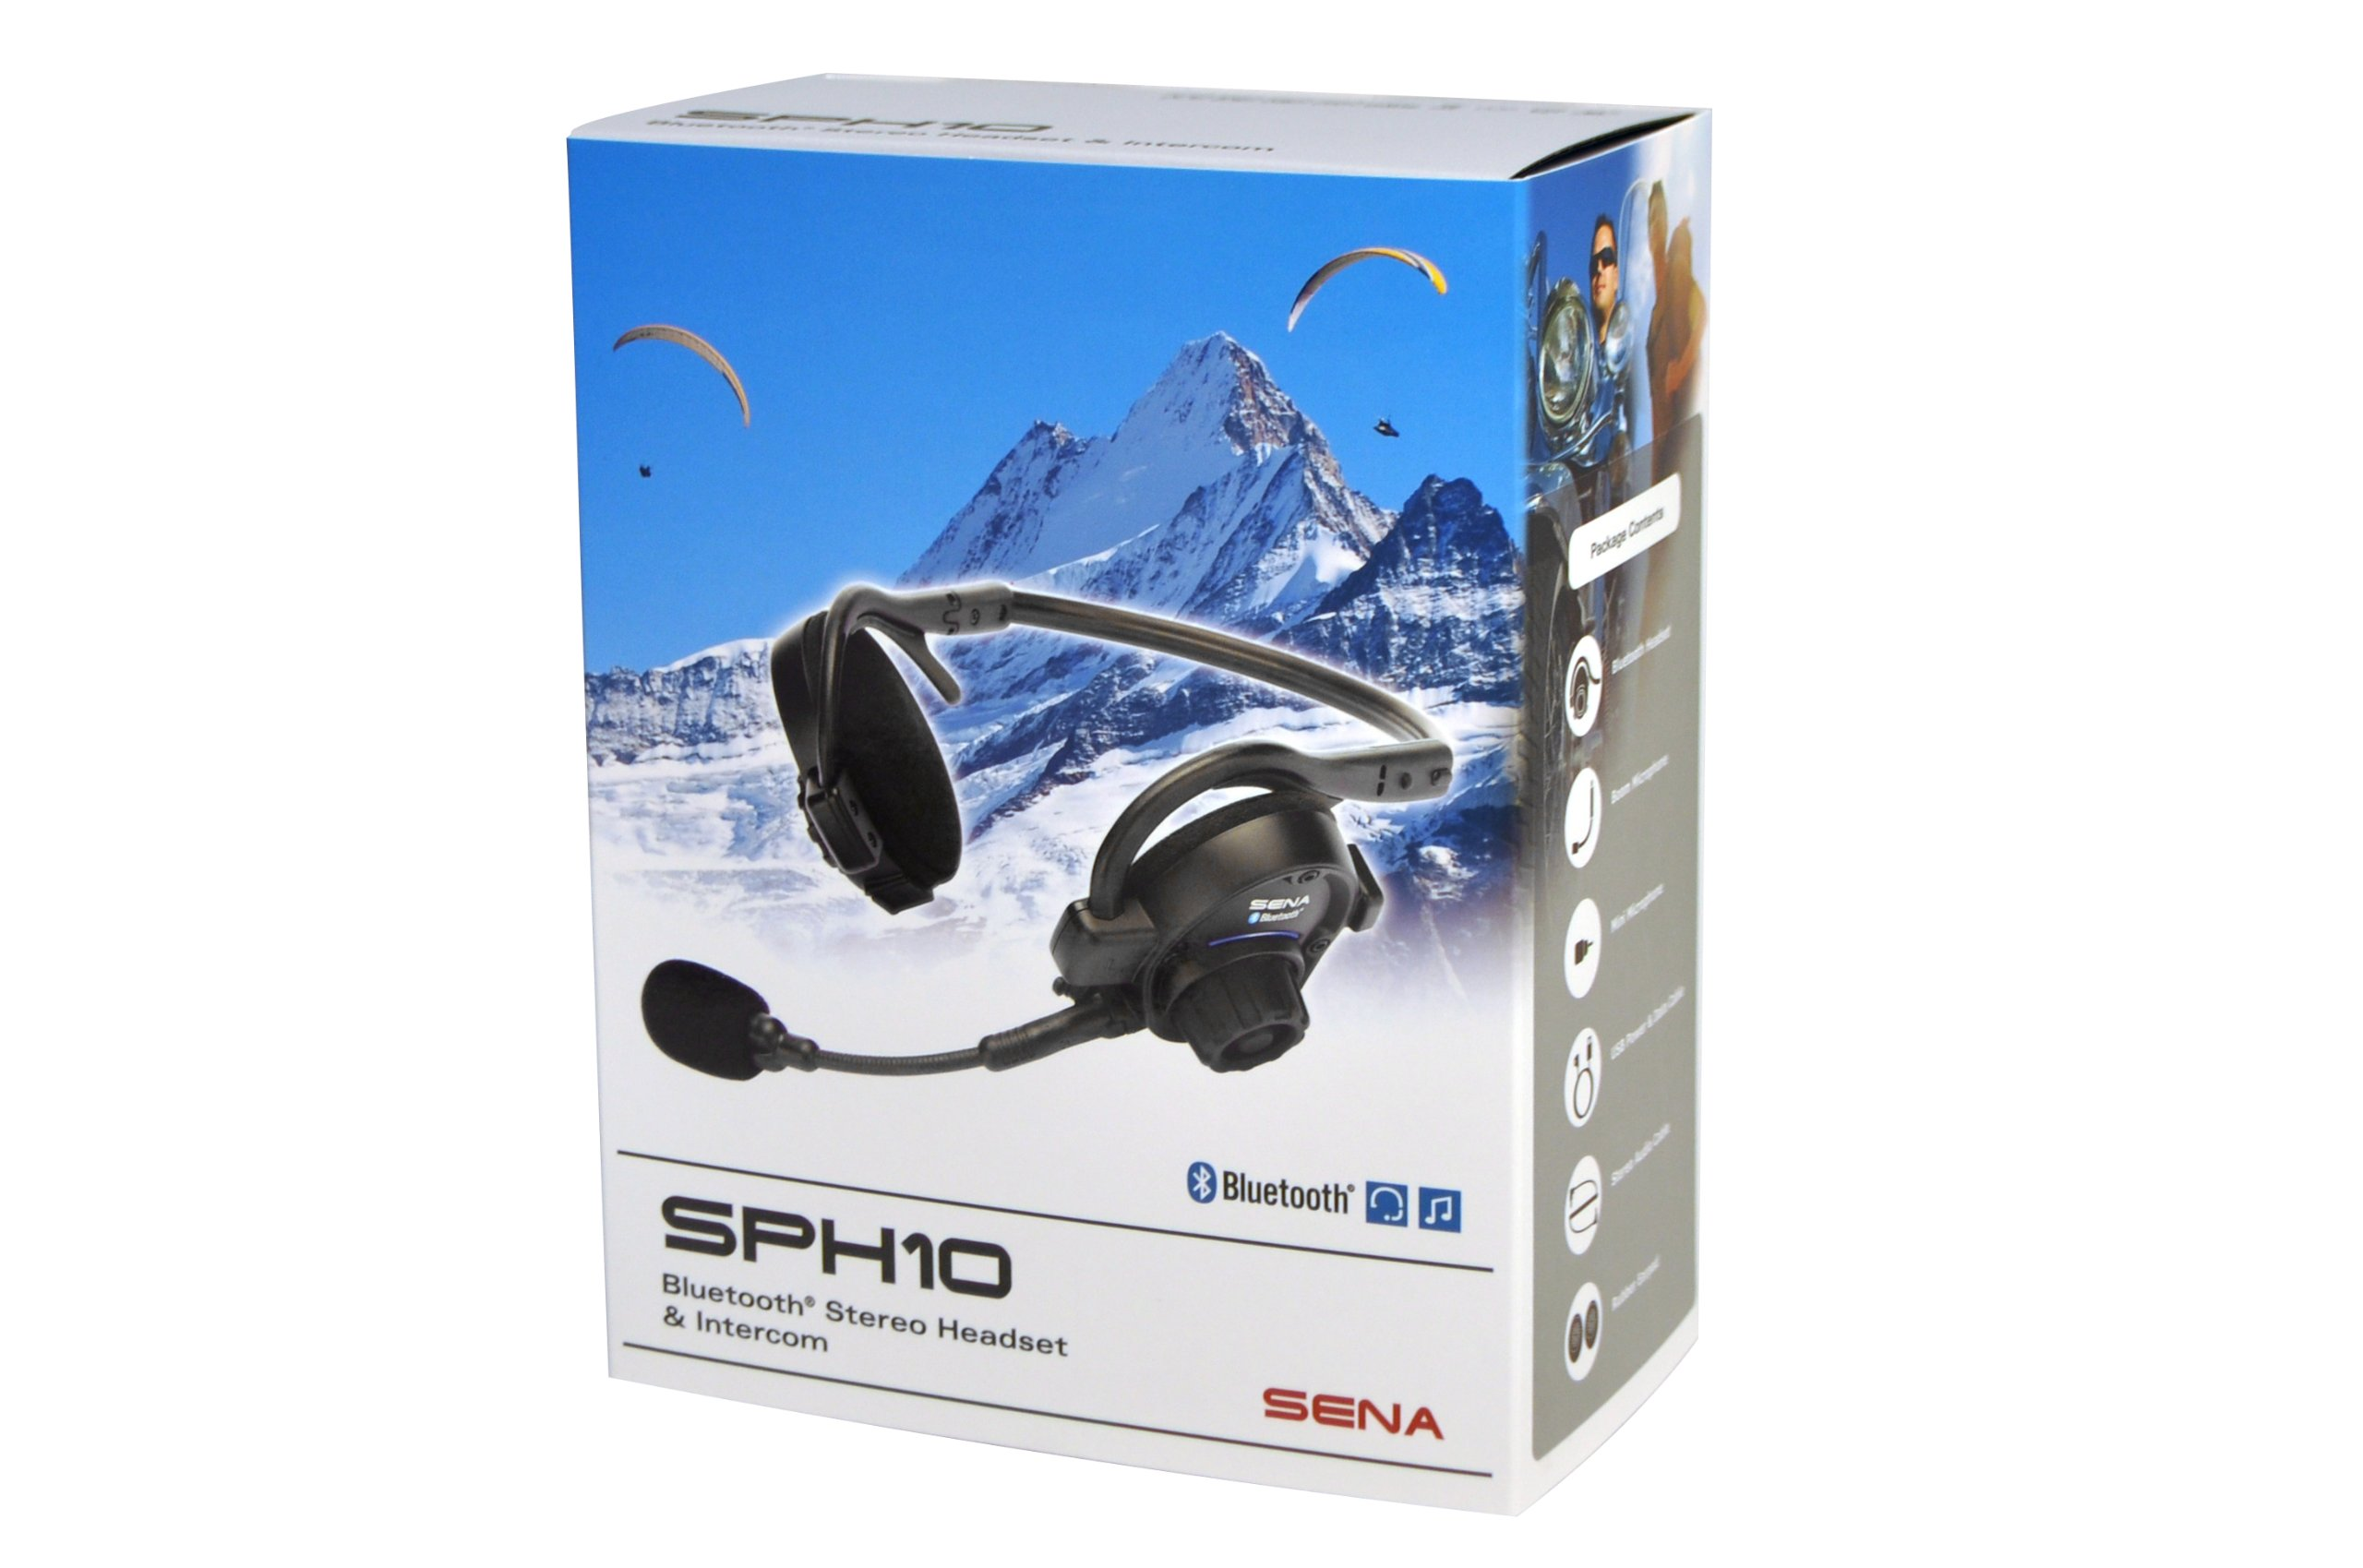 Sena SPH10-10 Outdoor Sports Bluetooth Stereo Headset / Intercom by Sena (Image #7)